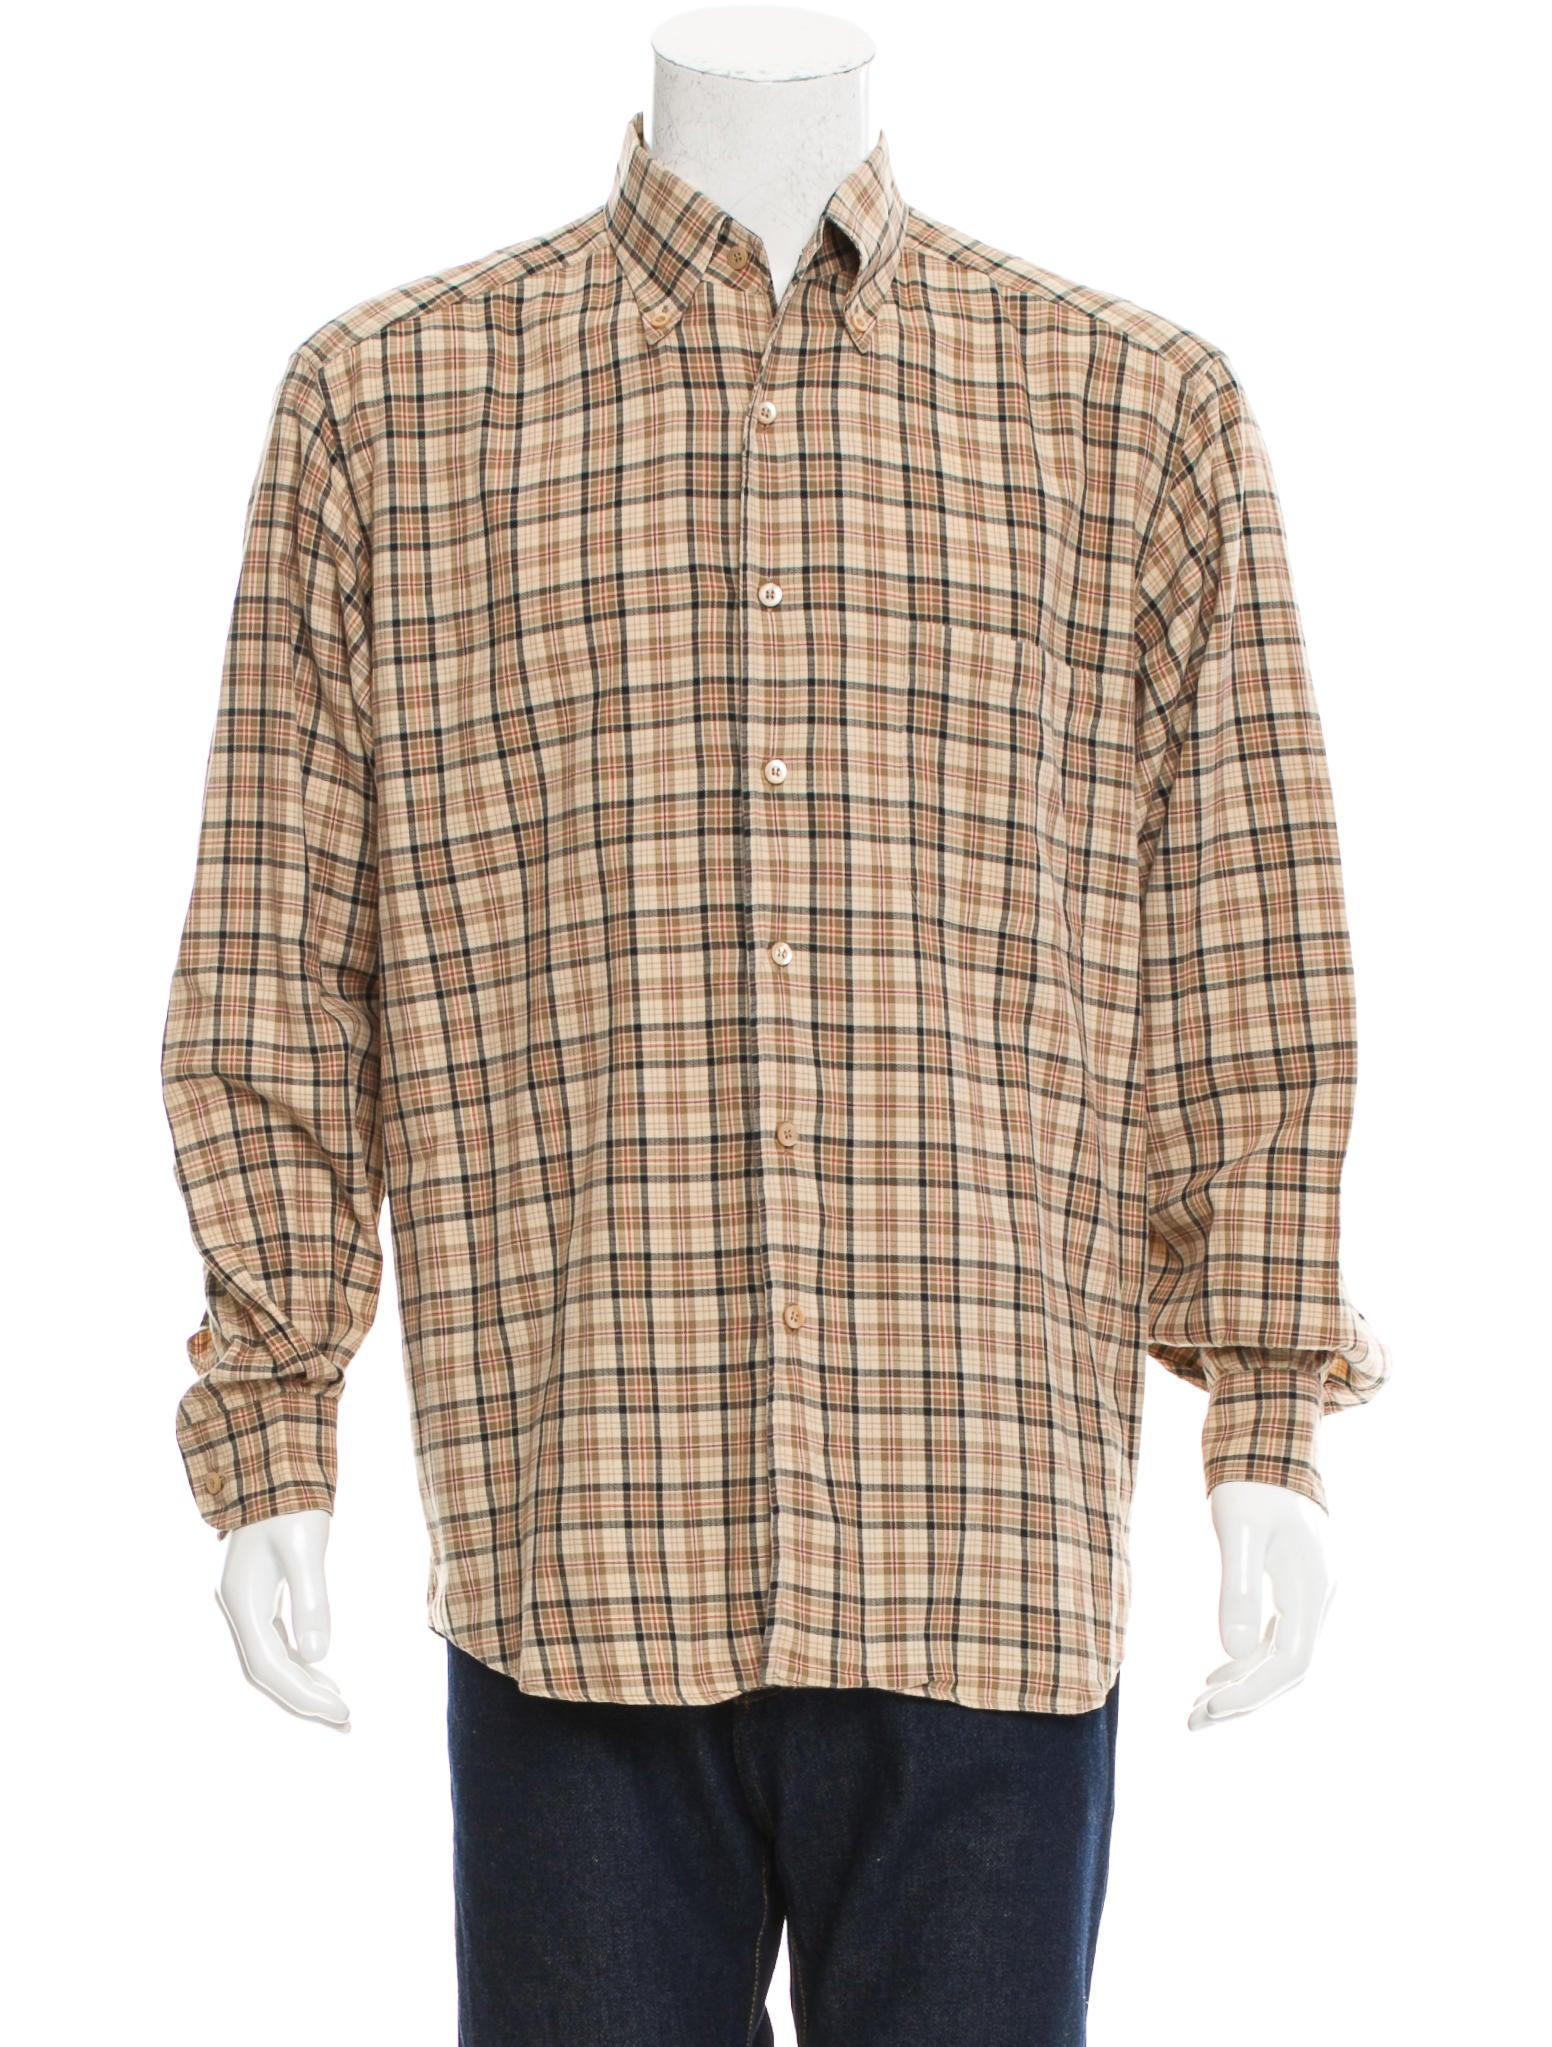 ermenegildo zegna plaid button up shirt clothing zgn24221 the realreal. Black Bedroom Furniture Sets. Home Design Ideas